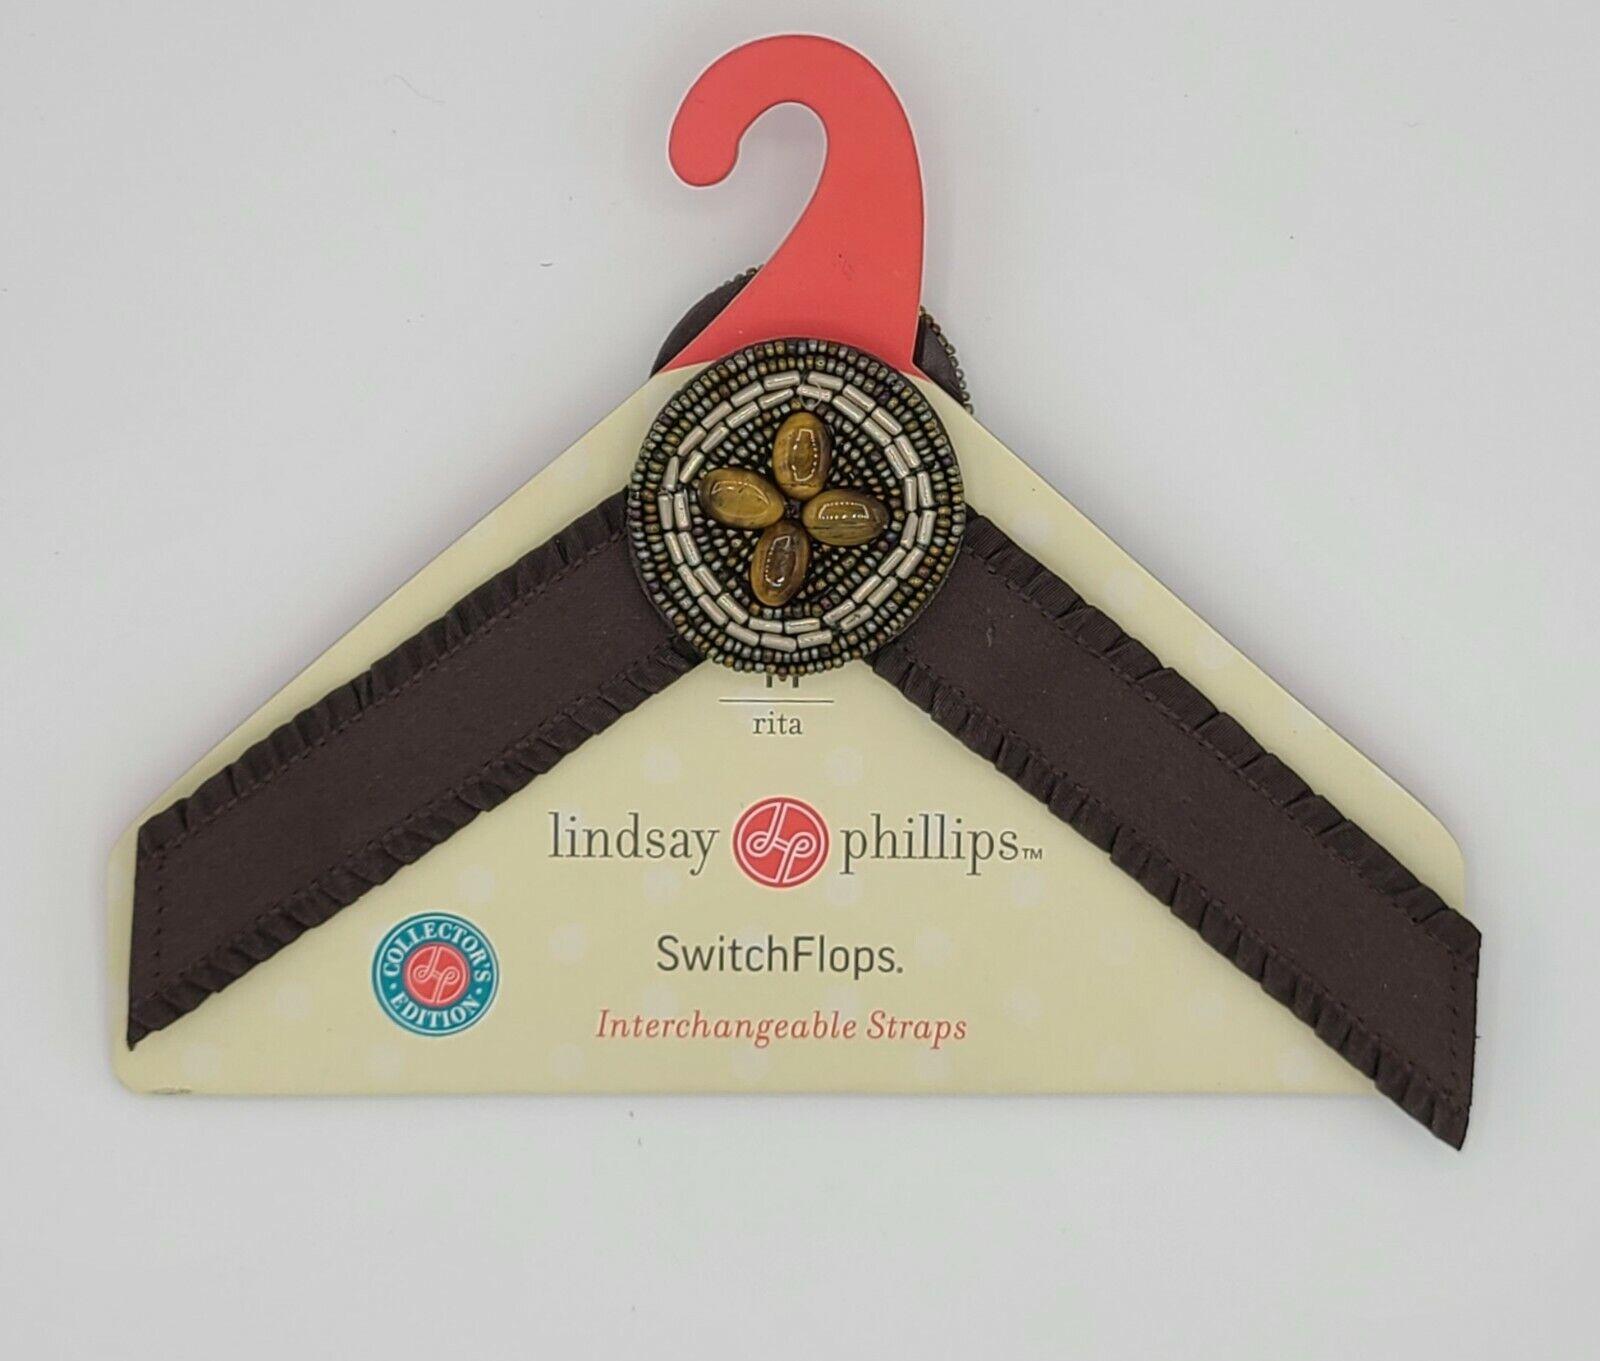 Retired Lindsay Phillips Switch Flops Straps Style Rita, Beads Size: Medium